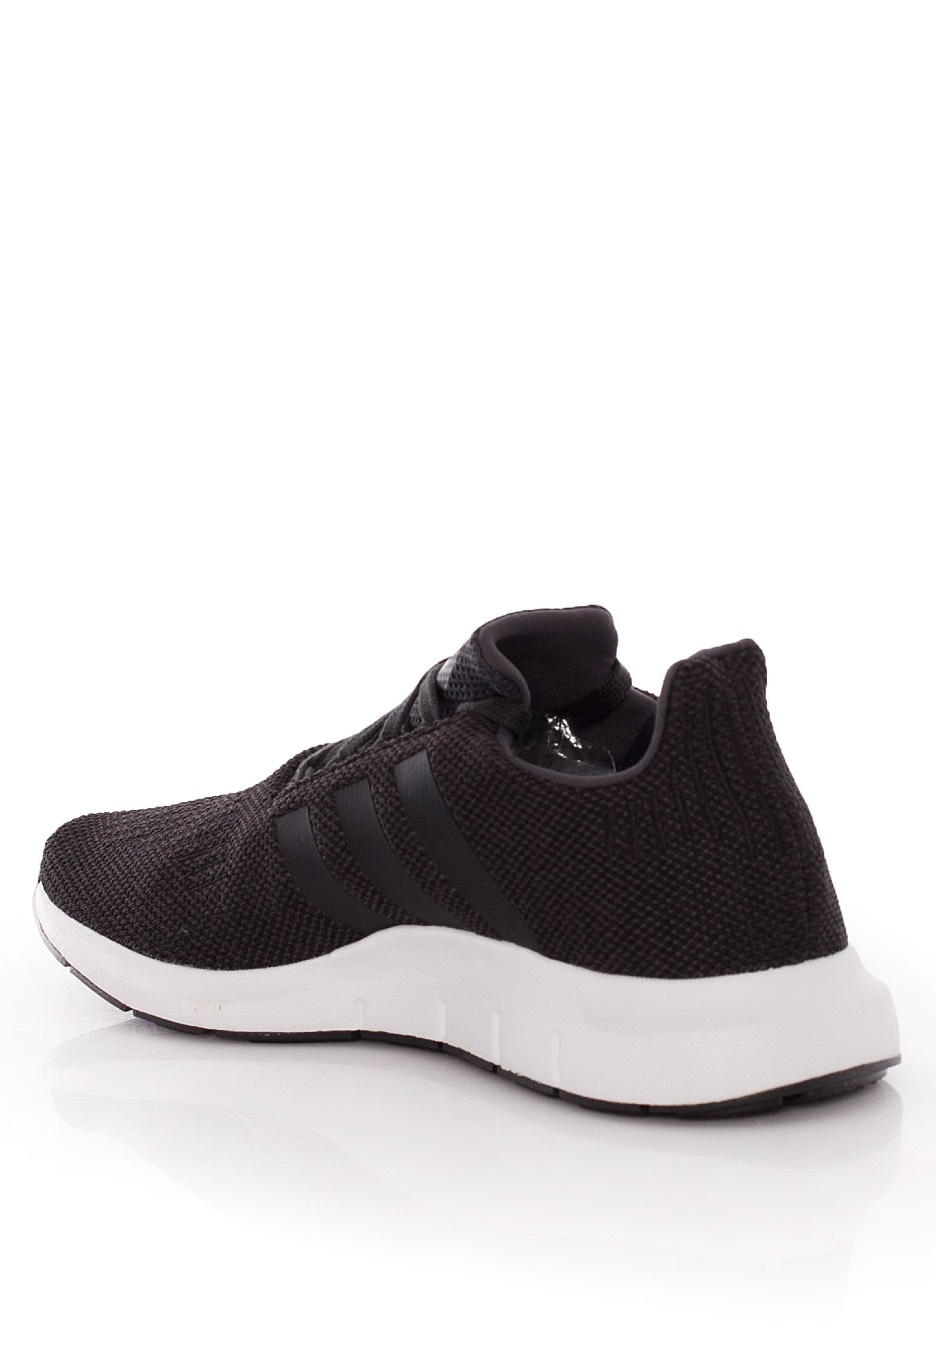 Swift Heather Carboncore Grey Blackmedium Run Adidas Shoes XOfdqX